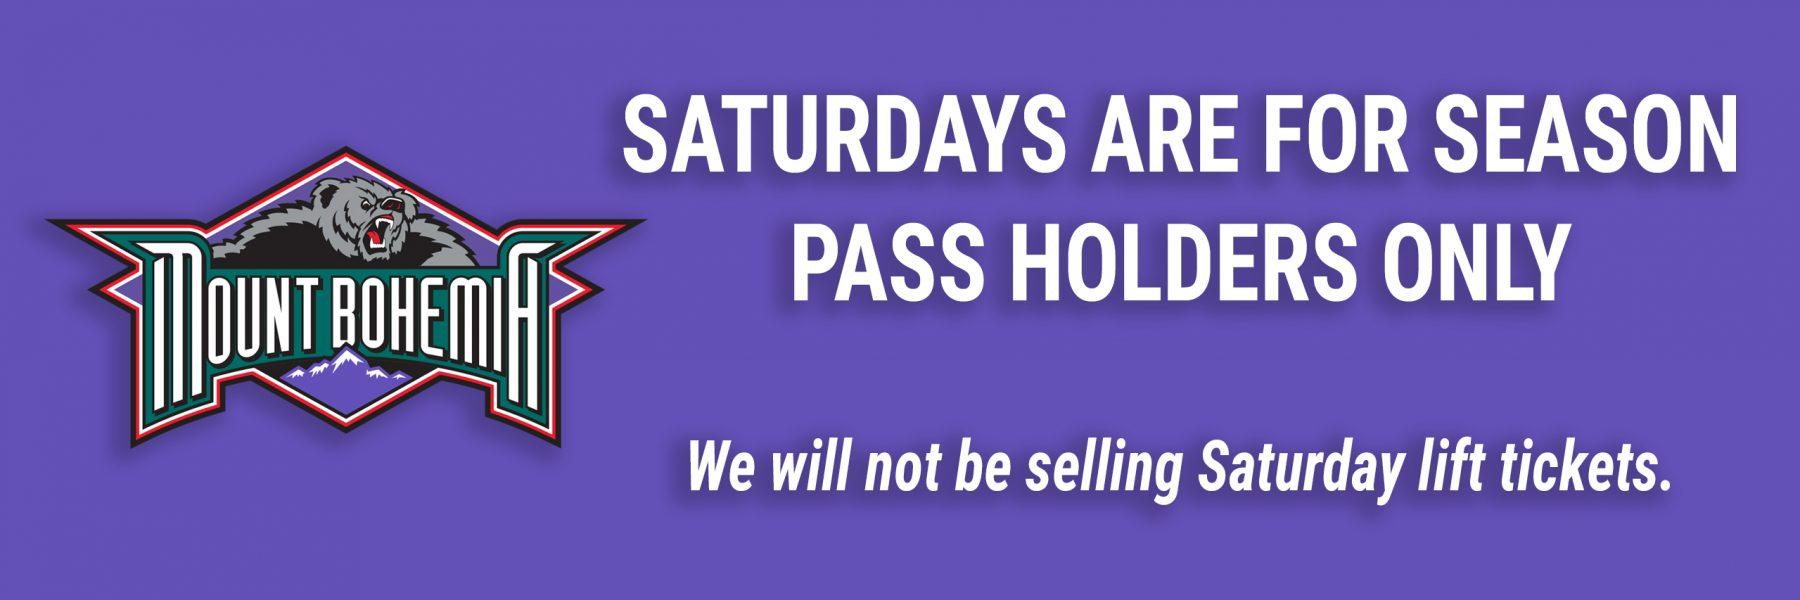 saturday 4 season pass holders only